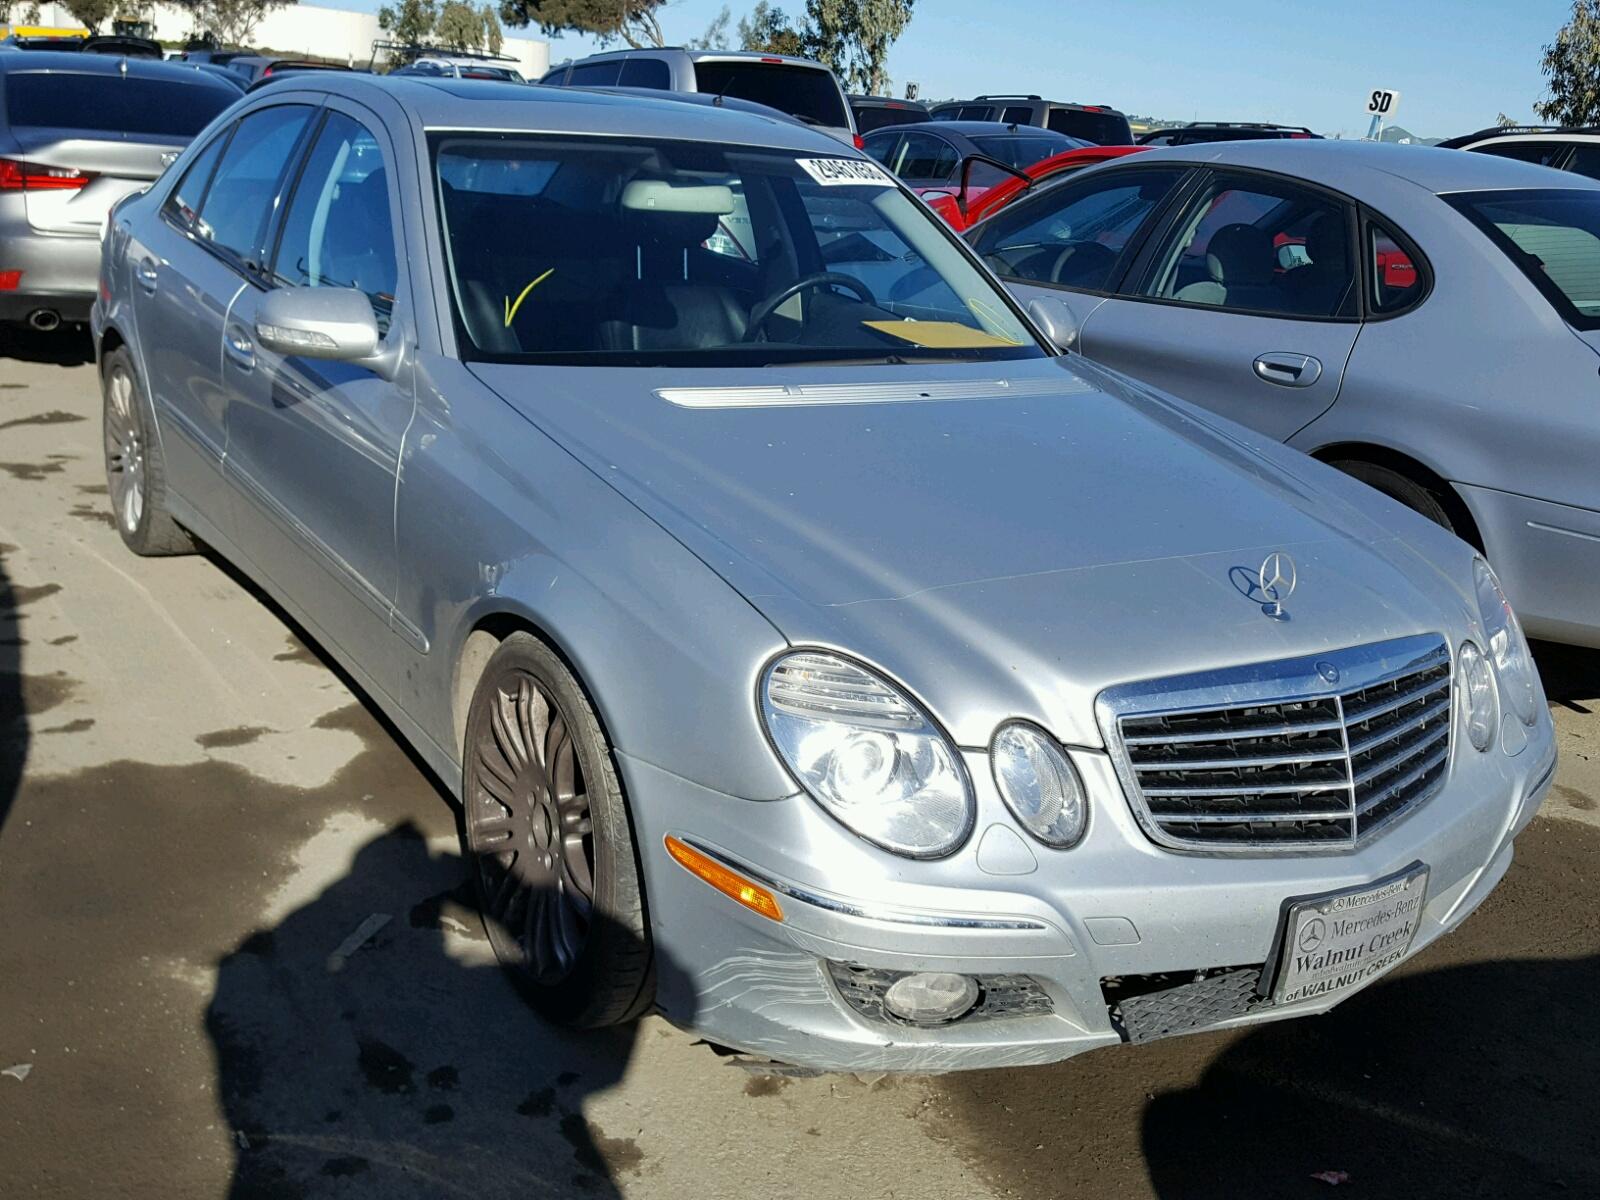 2007 Mercedes Benz E 350 Side Damage WDBUF56X17B Sold